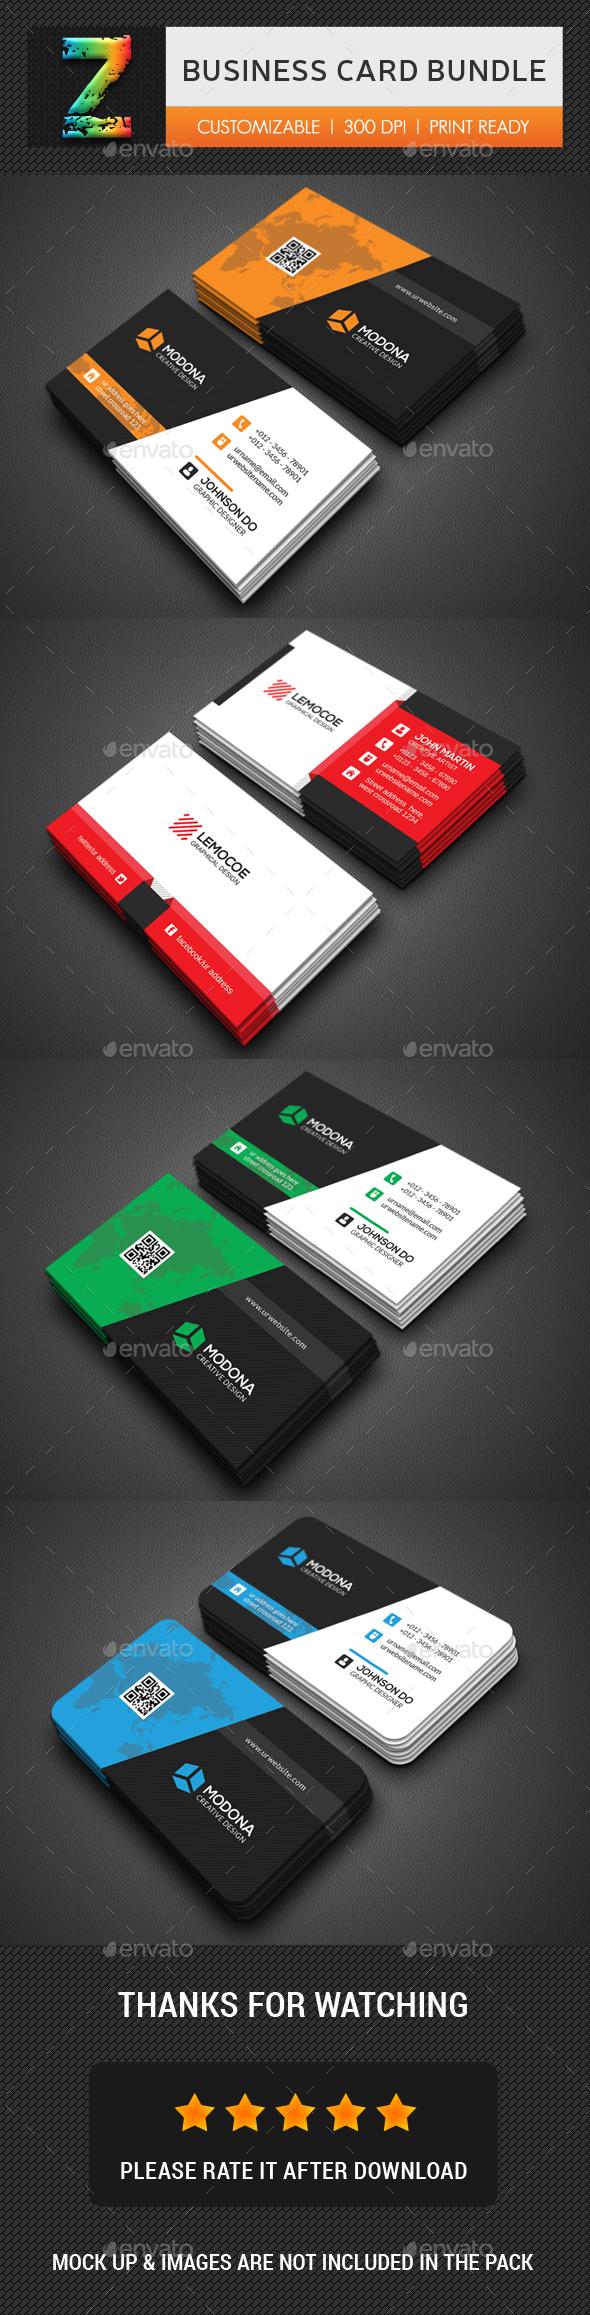 Business Card Template PSD Bundle   Business Card Templates ...